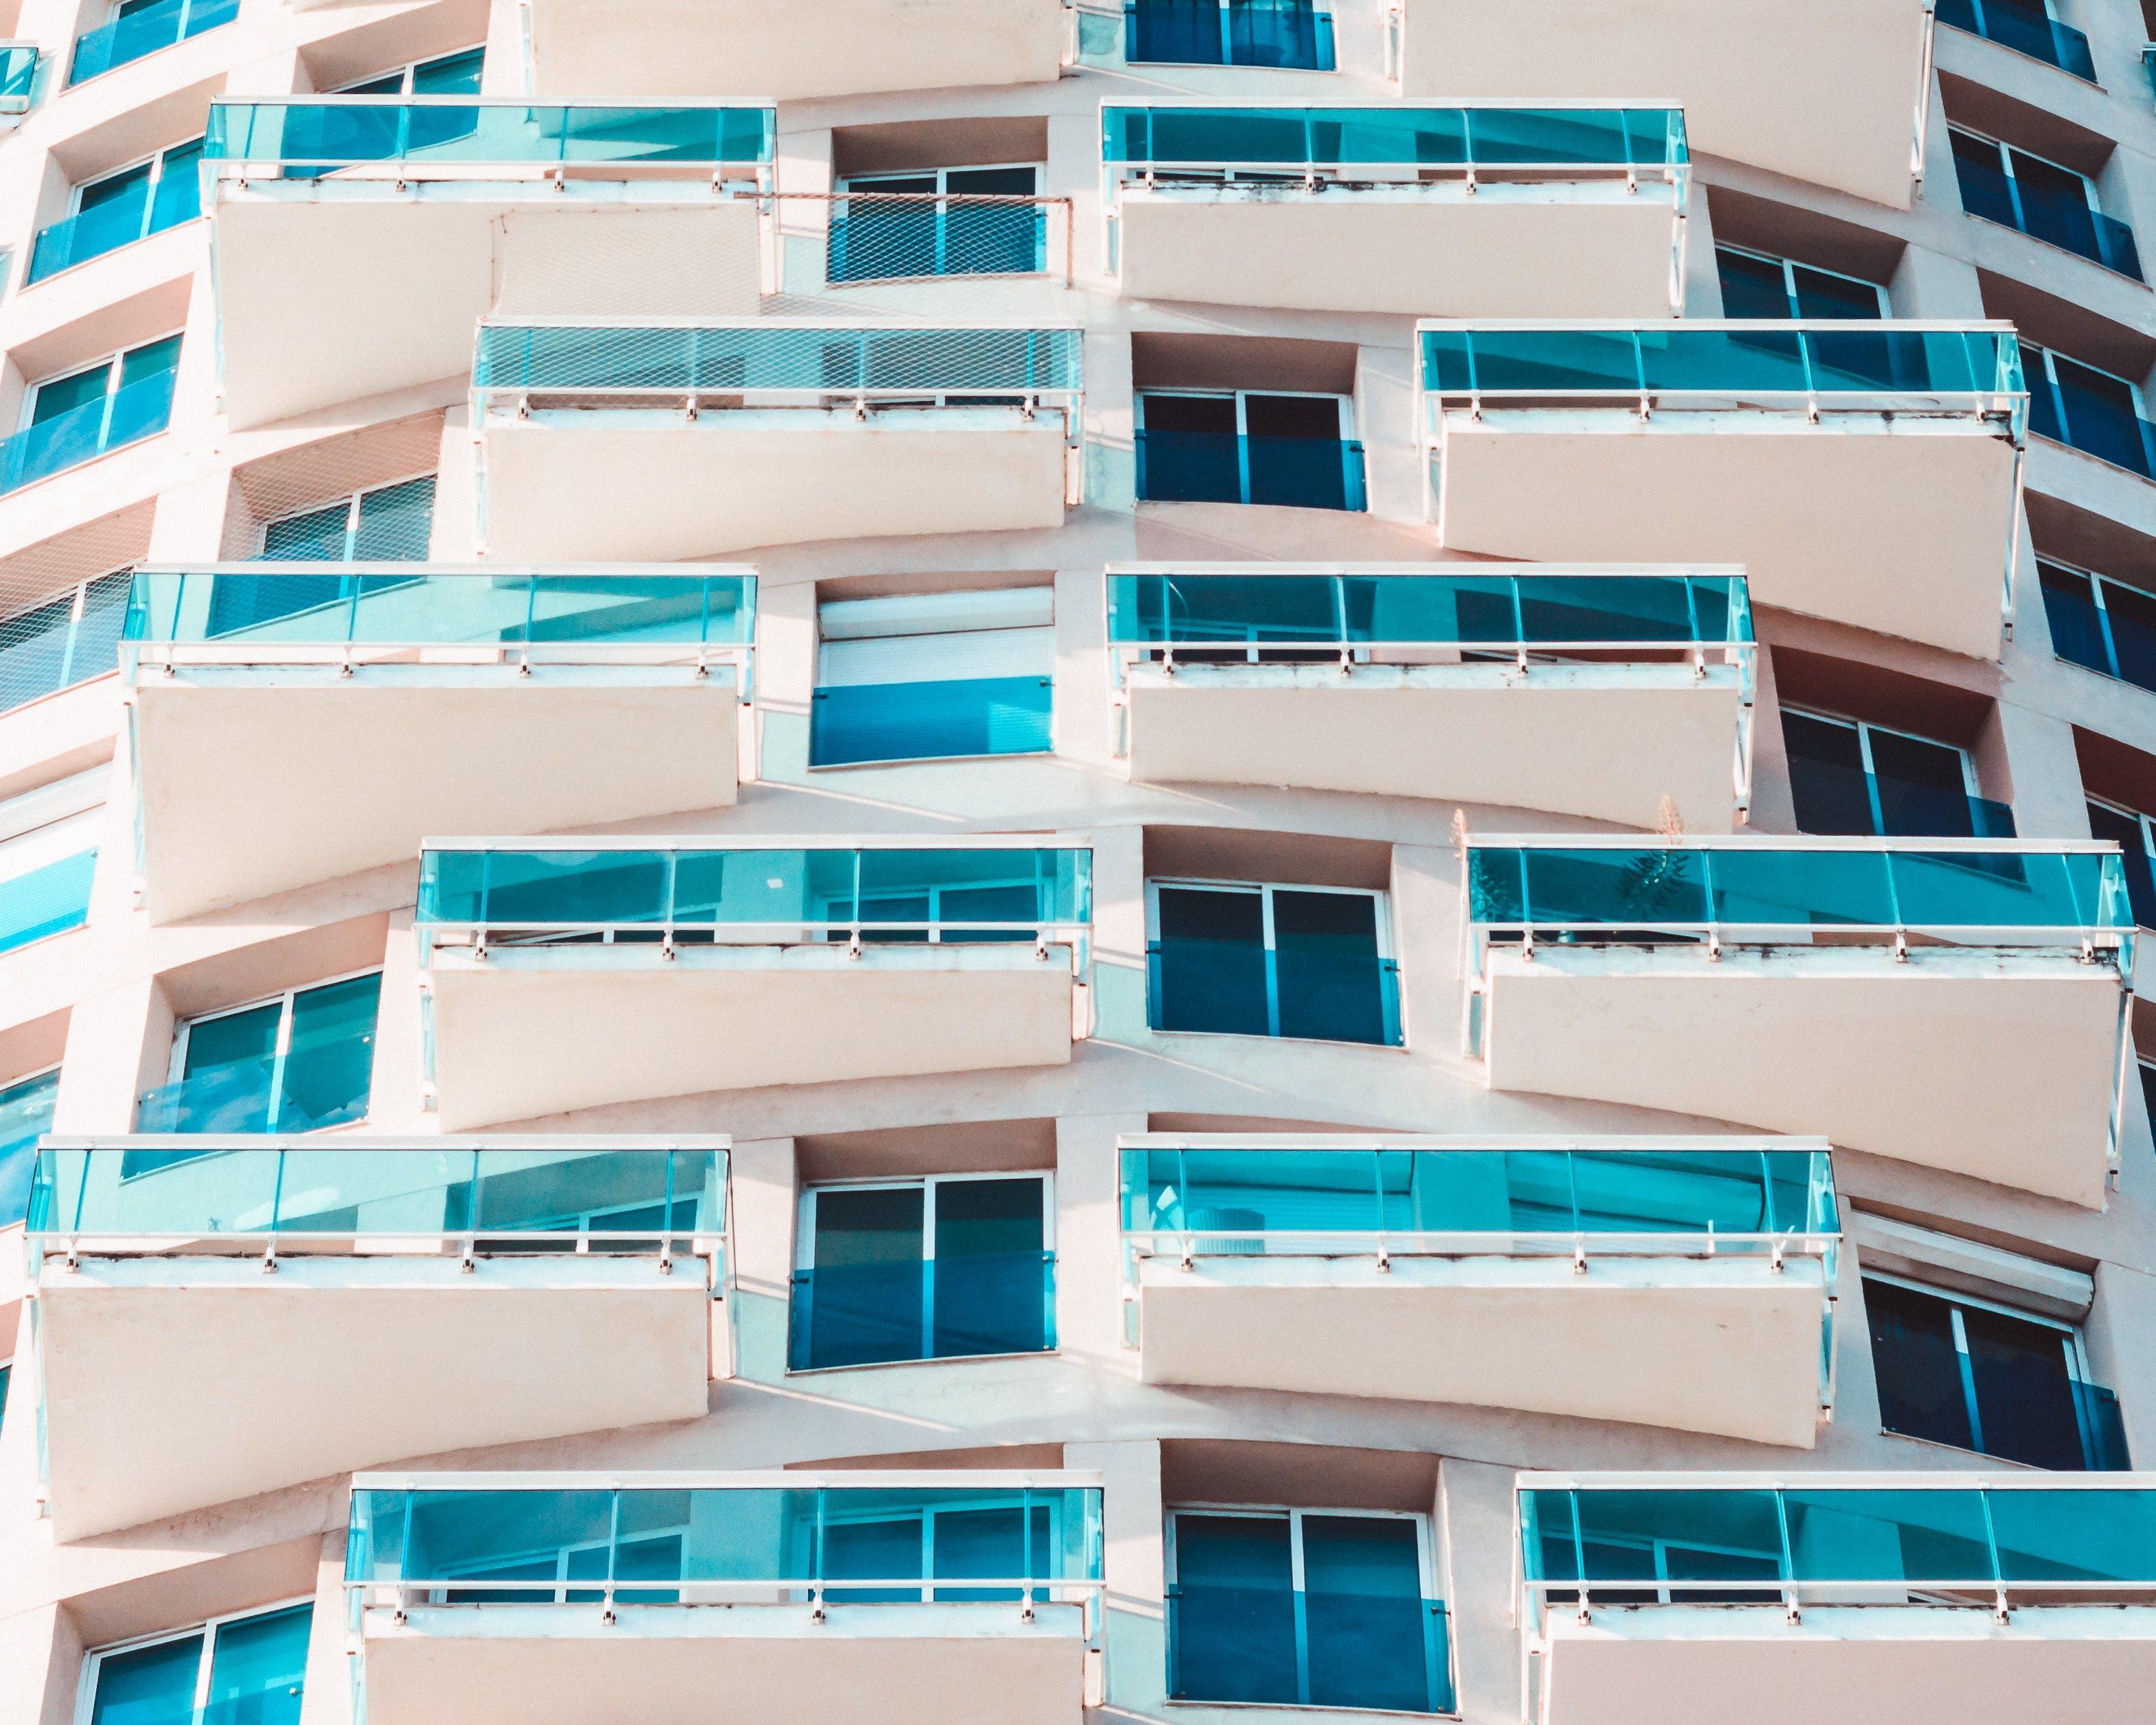 Kostnadsfri bild av arkitektonisk design, arkitektur, balkonger, byggnad